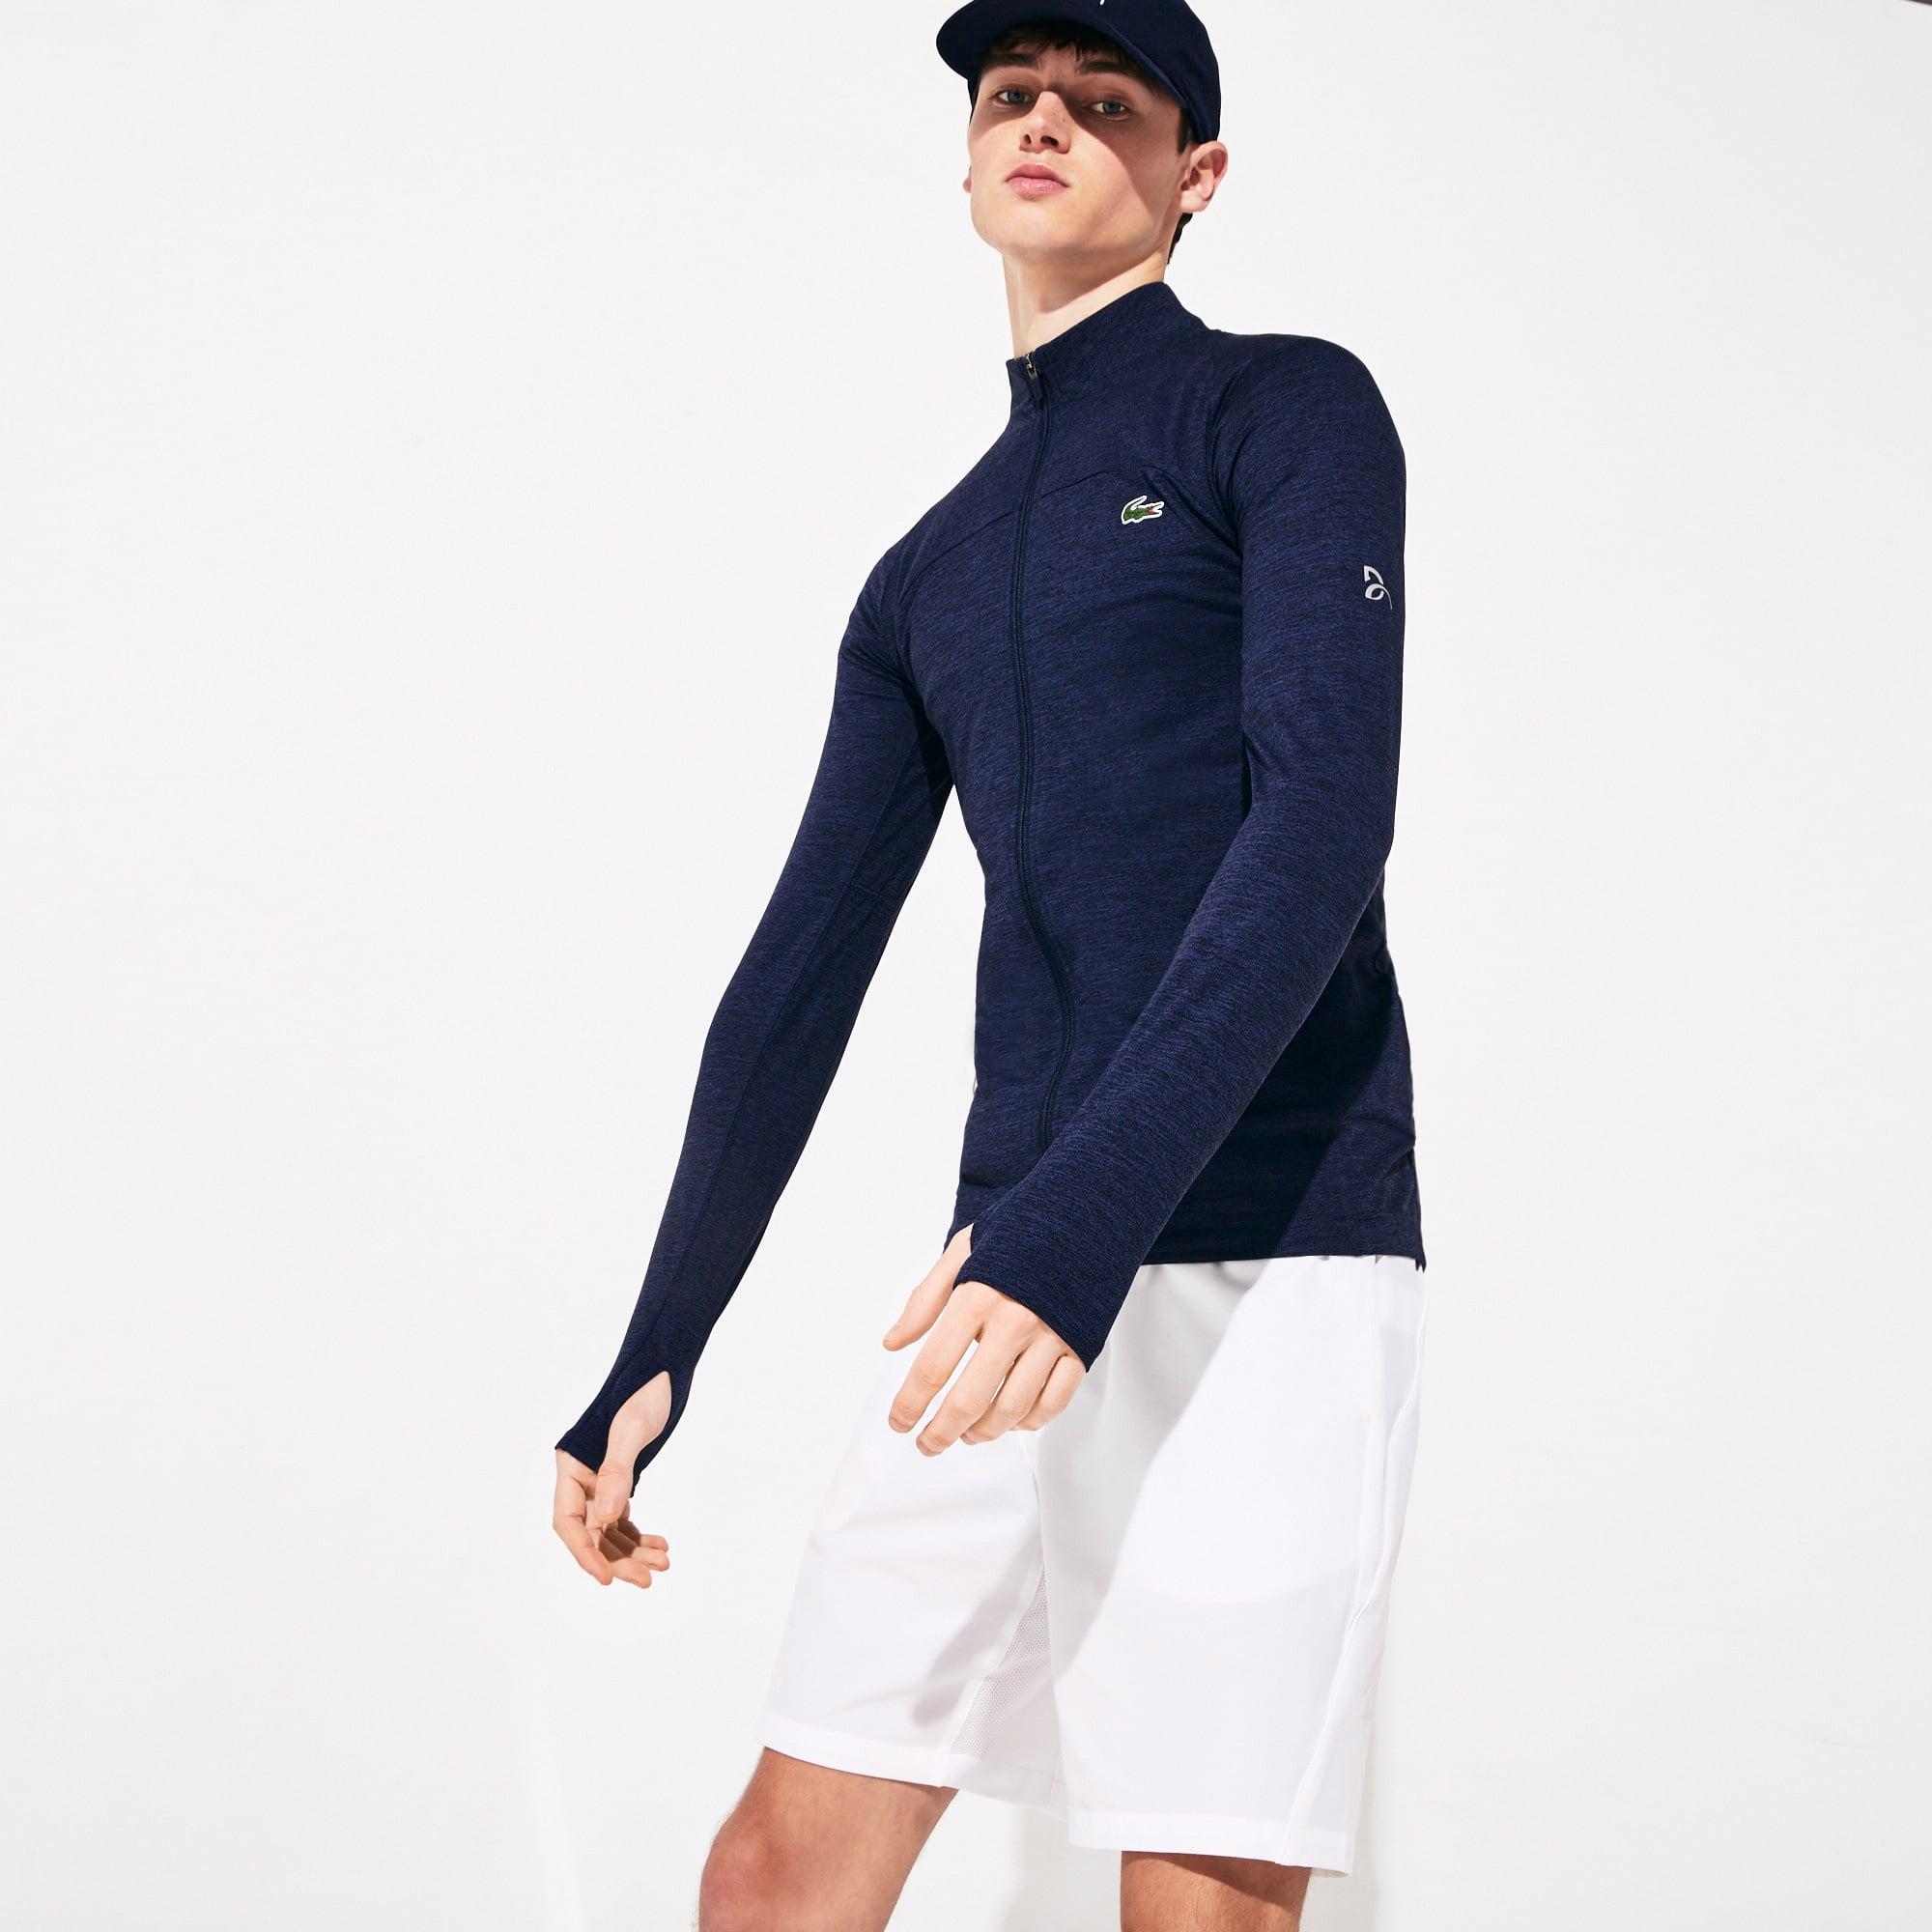 Veste zippée Lacoste SPORT x Novak Djokovic stretch bi-matière